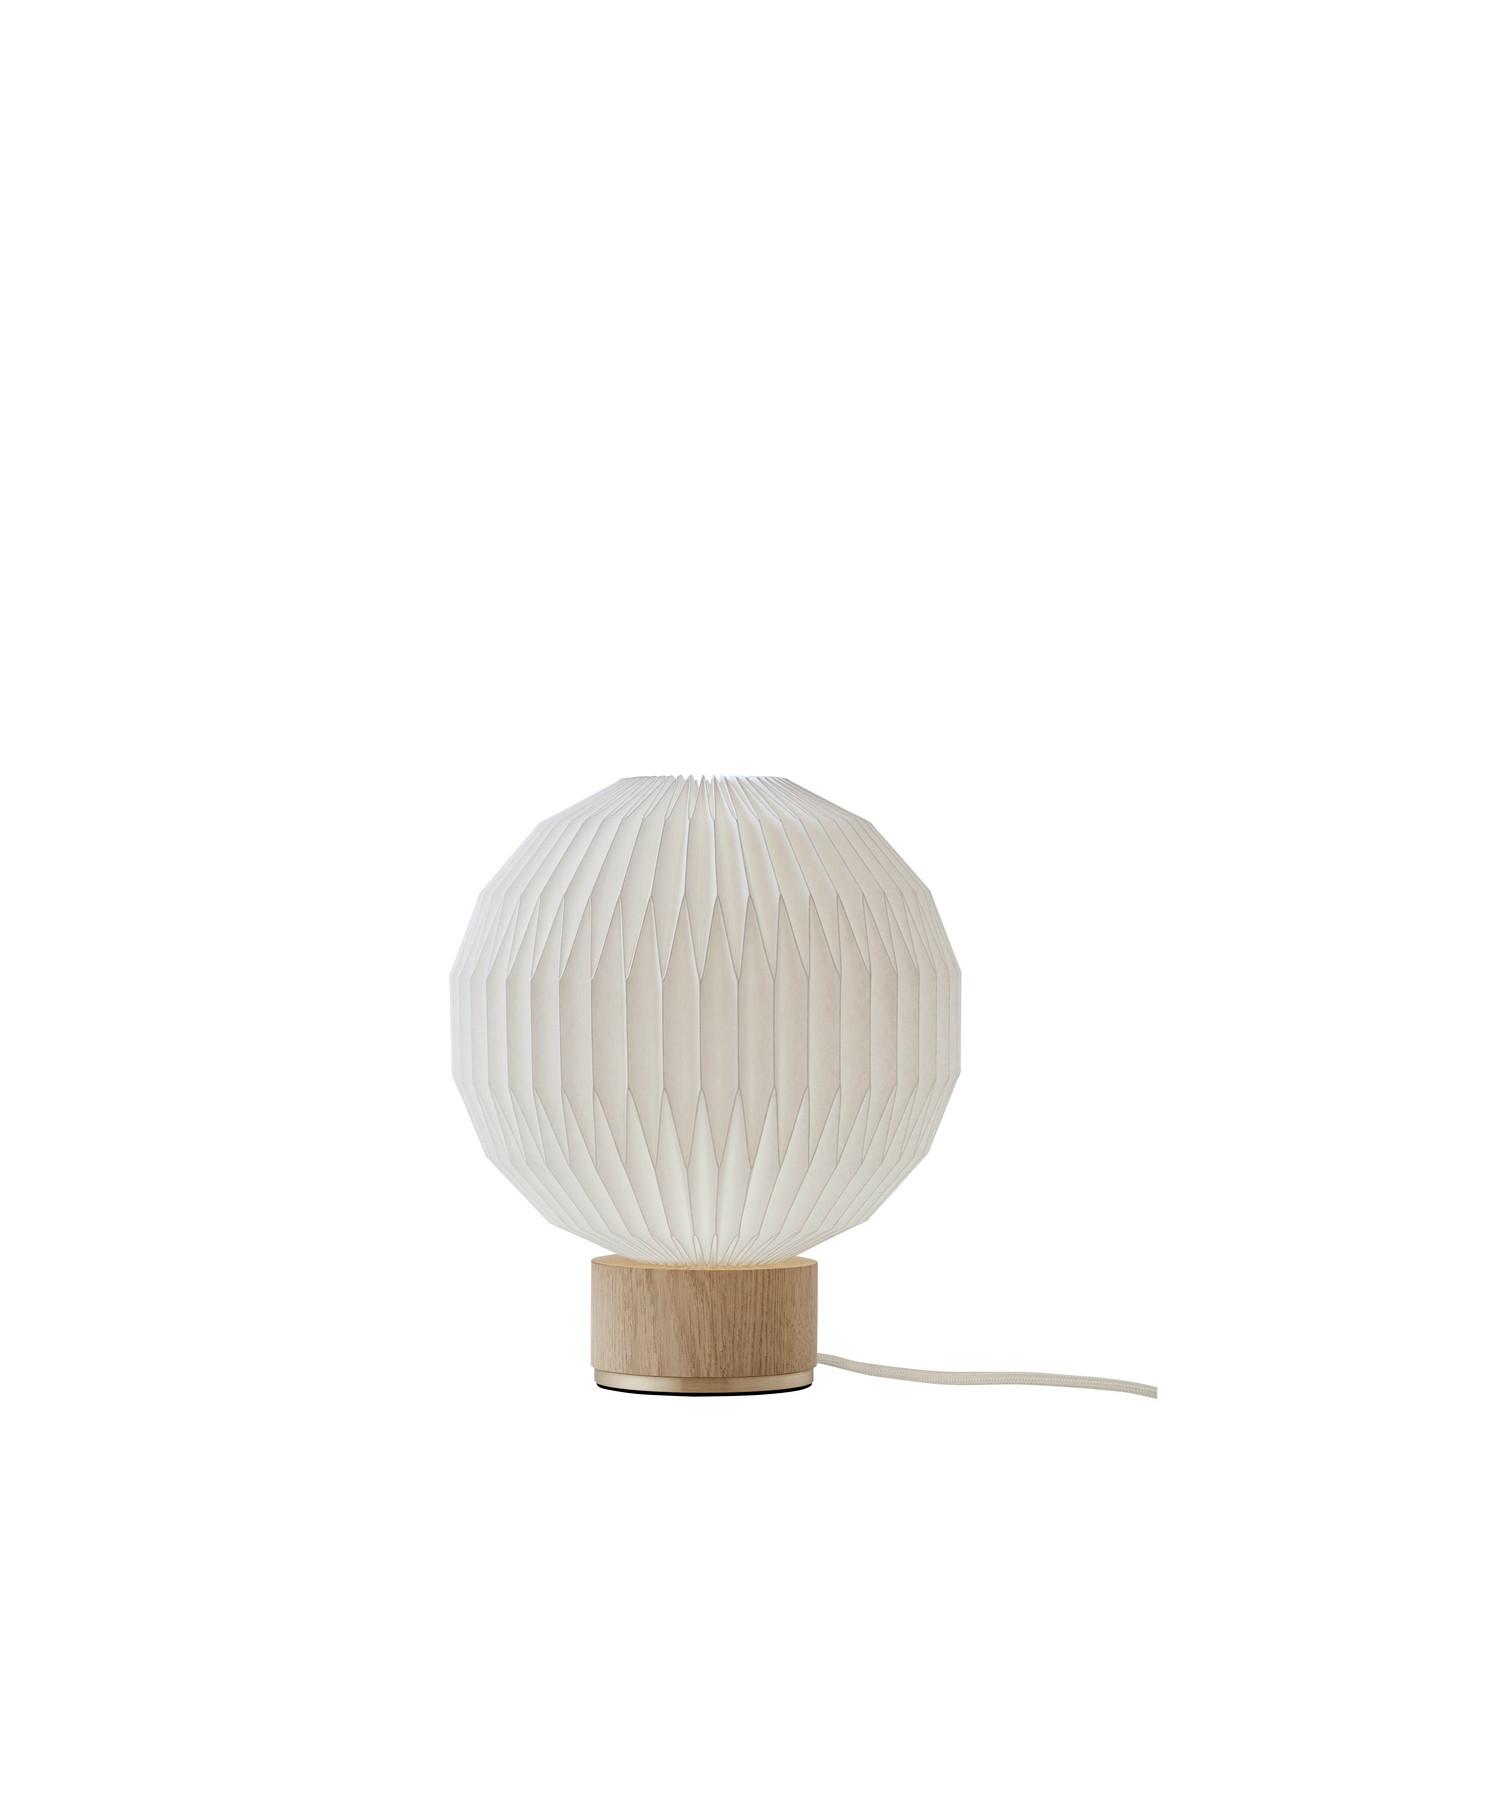 Le Klint 375 Bordlampe X-Small Plast - Le Klint